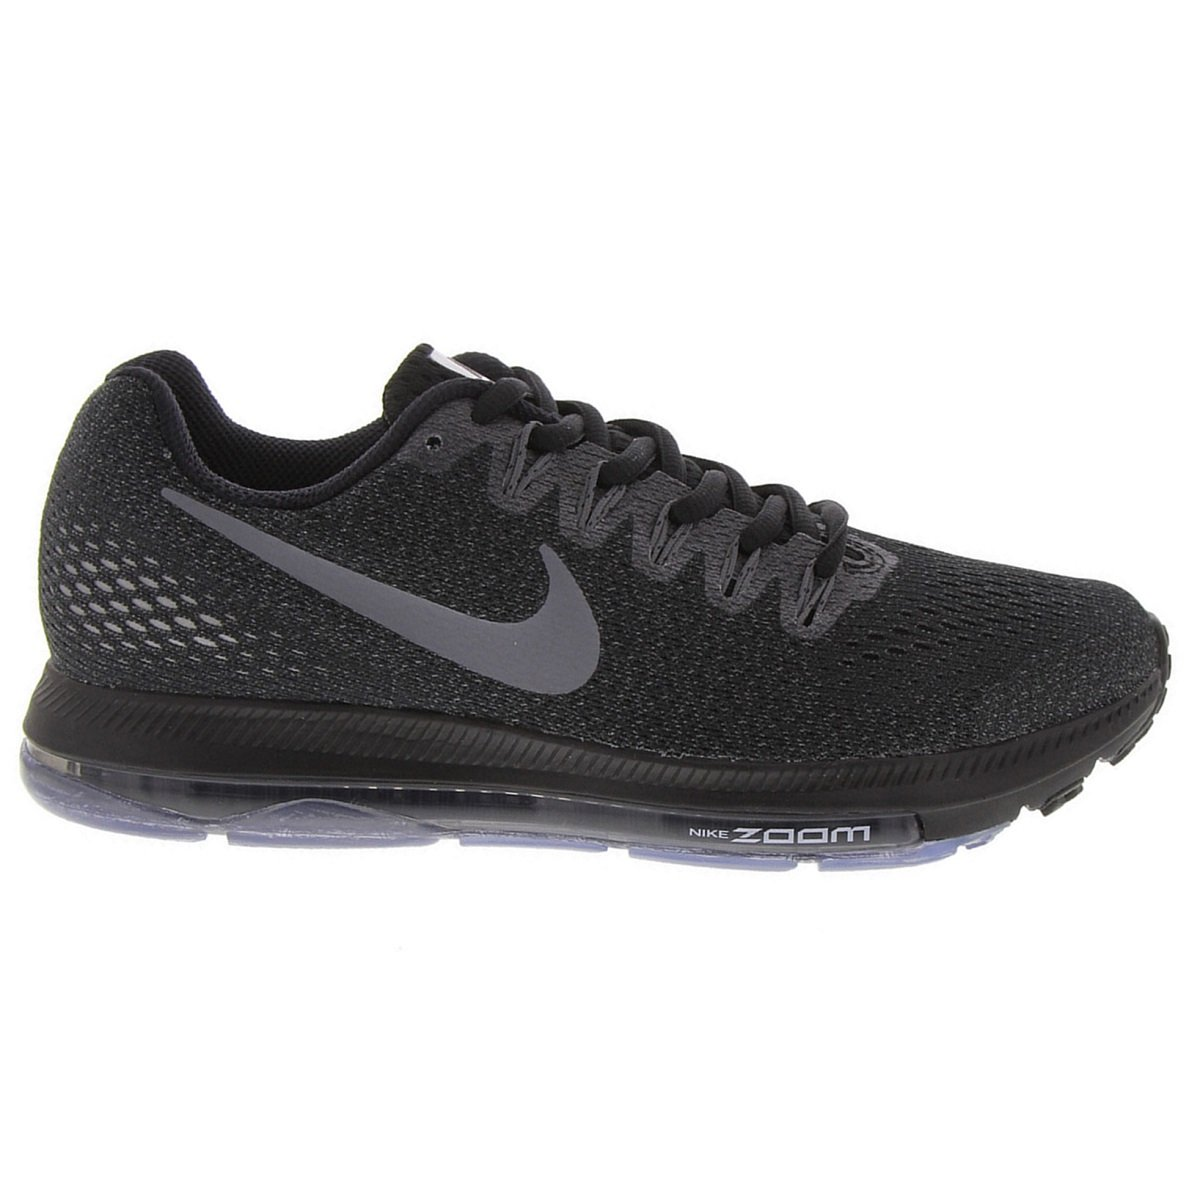 ae66240dcb Passe o mouse na imagem para ampliar Ampliar imagem. Tênis Nike Zoom ...